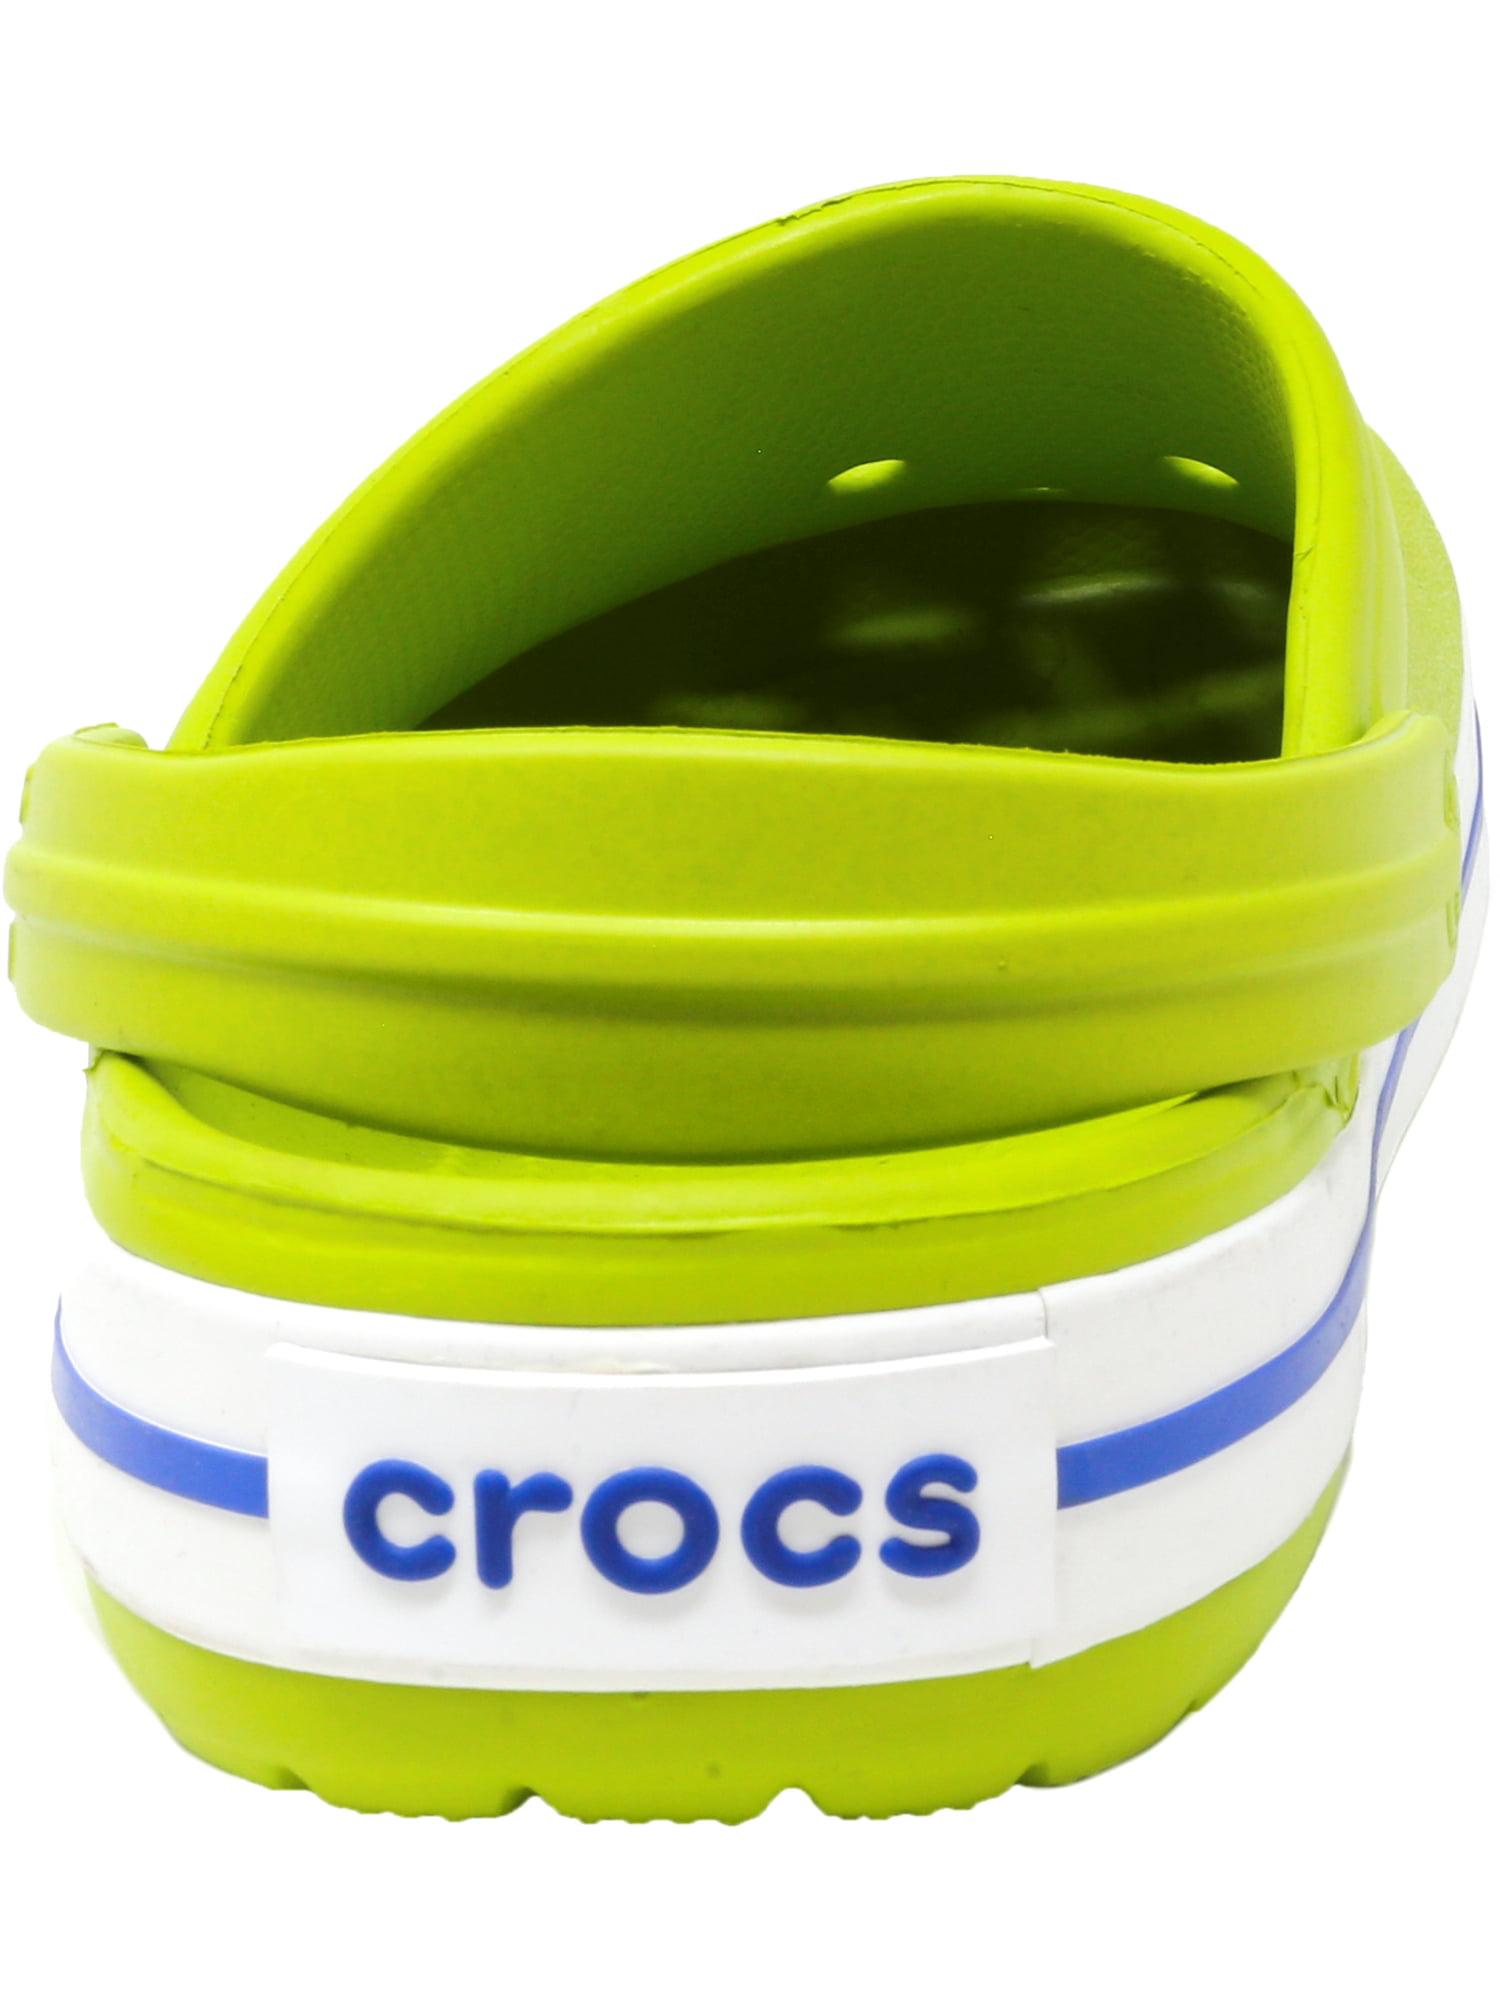 Crocs Men's Crocband Navy Ankle-High Rubber Sandal - 9M